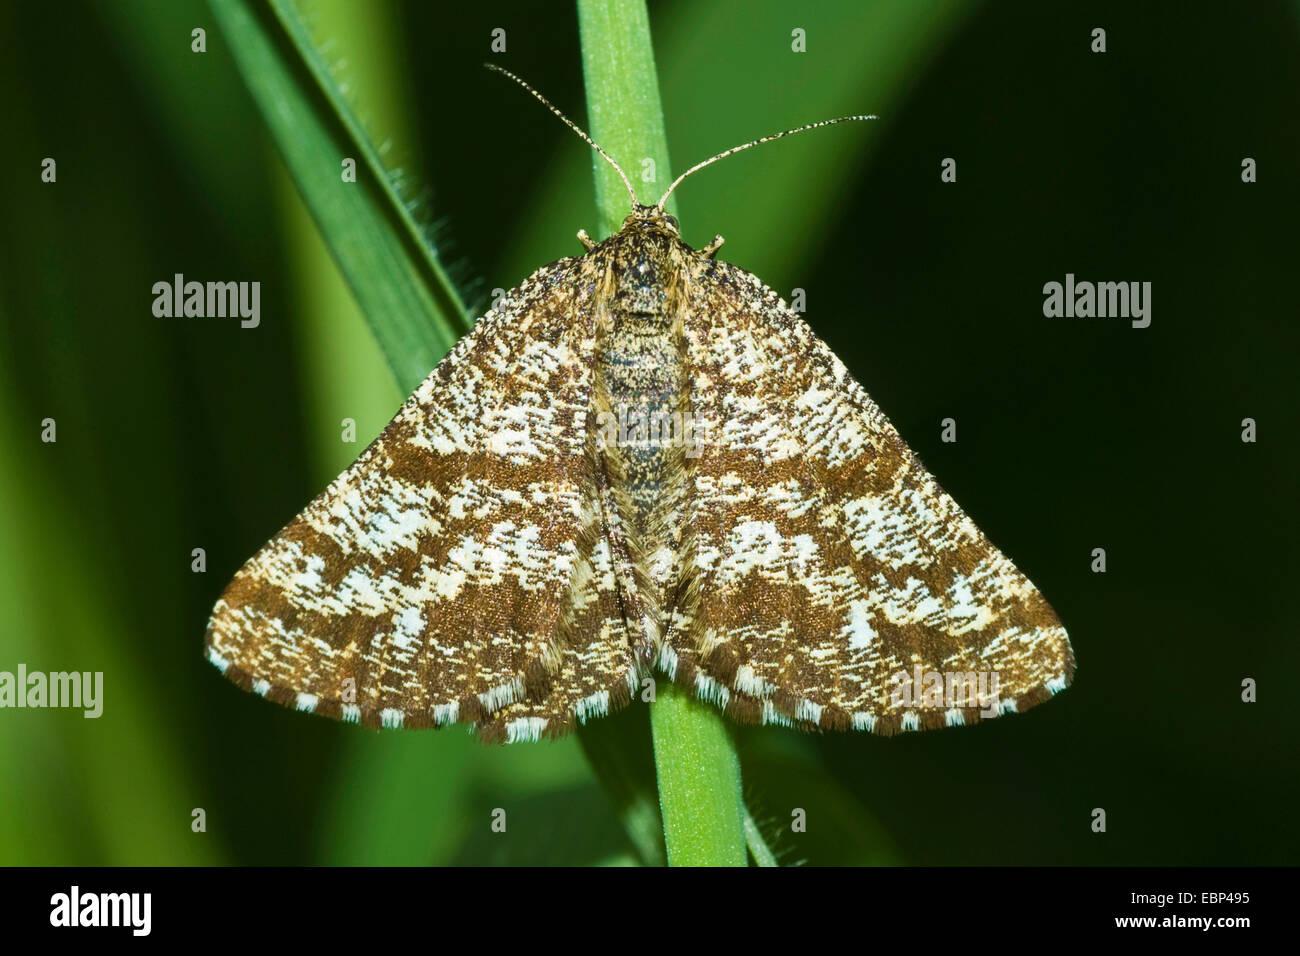 common heath (Ematurga atomaria), on a blade of grass, Germany - Stock Image